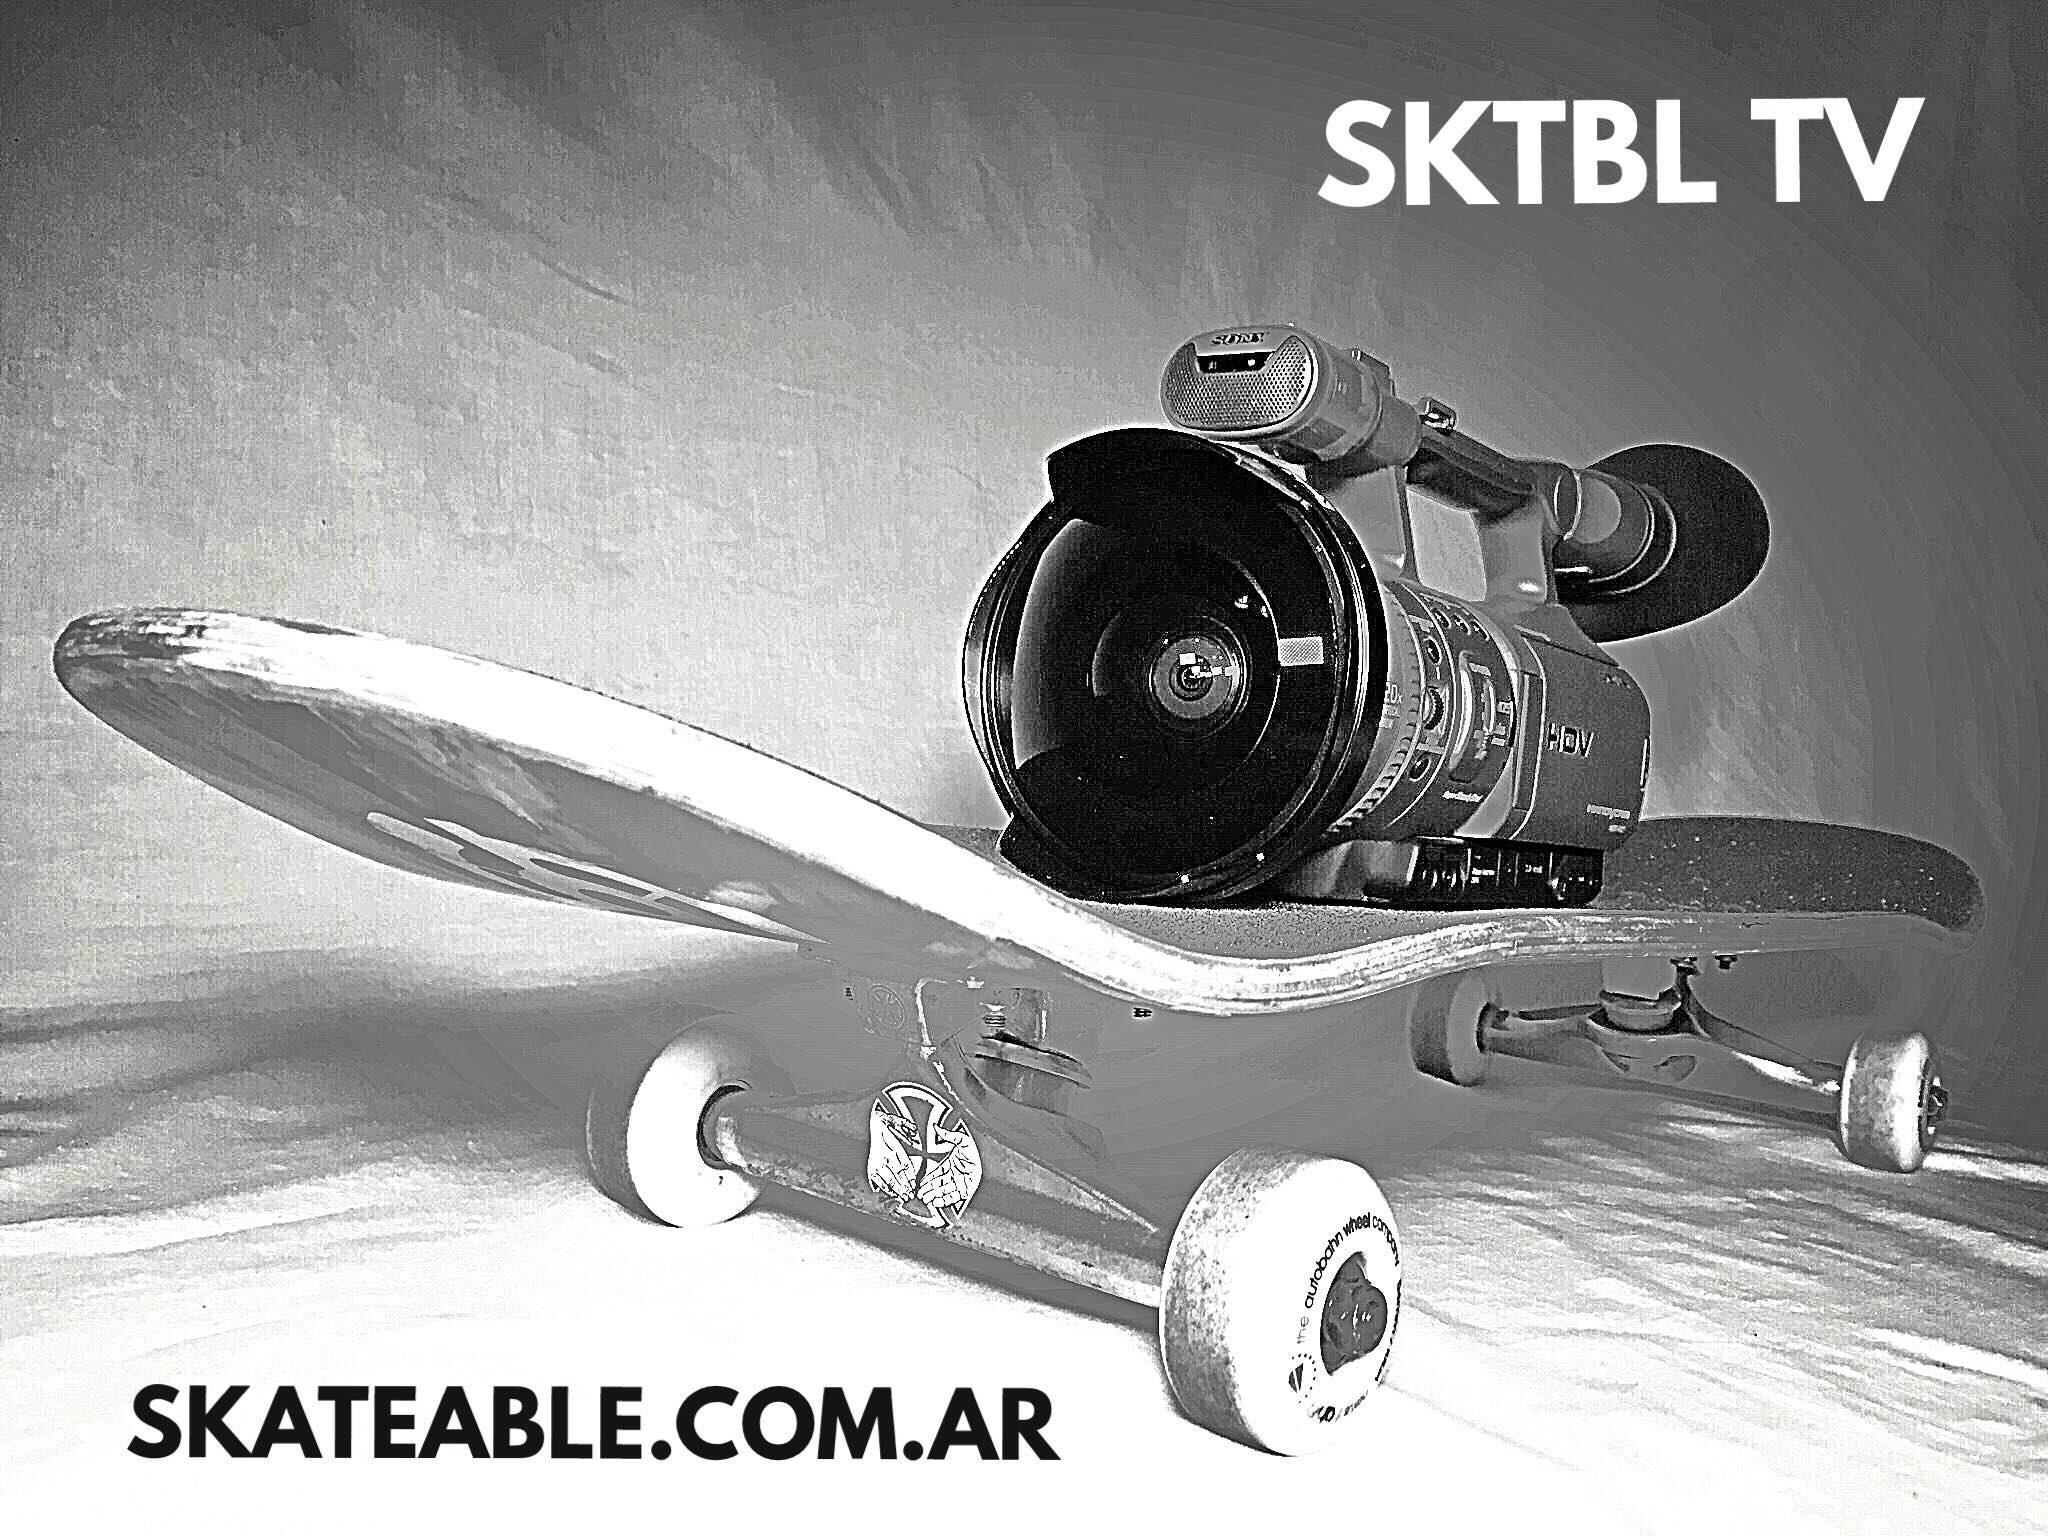 SKATEABLE.COM.AR